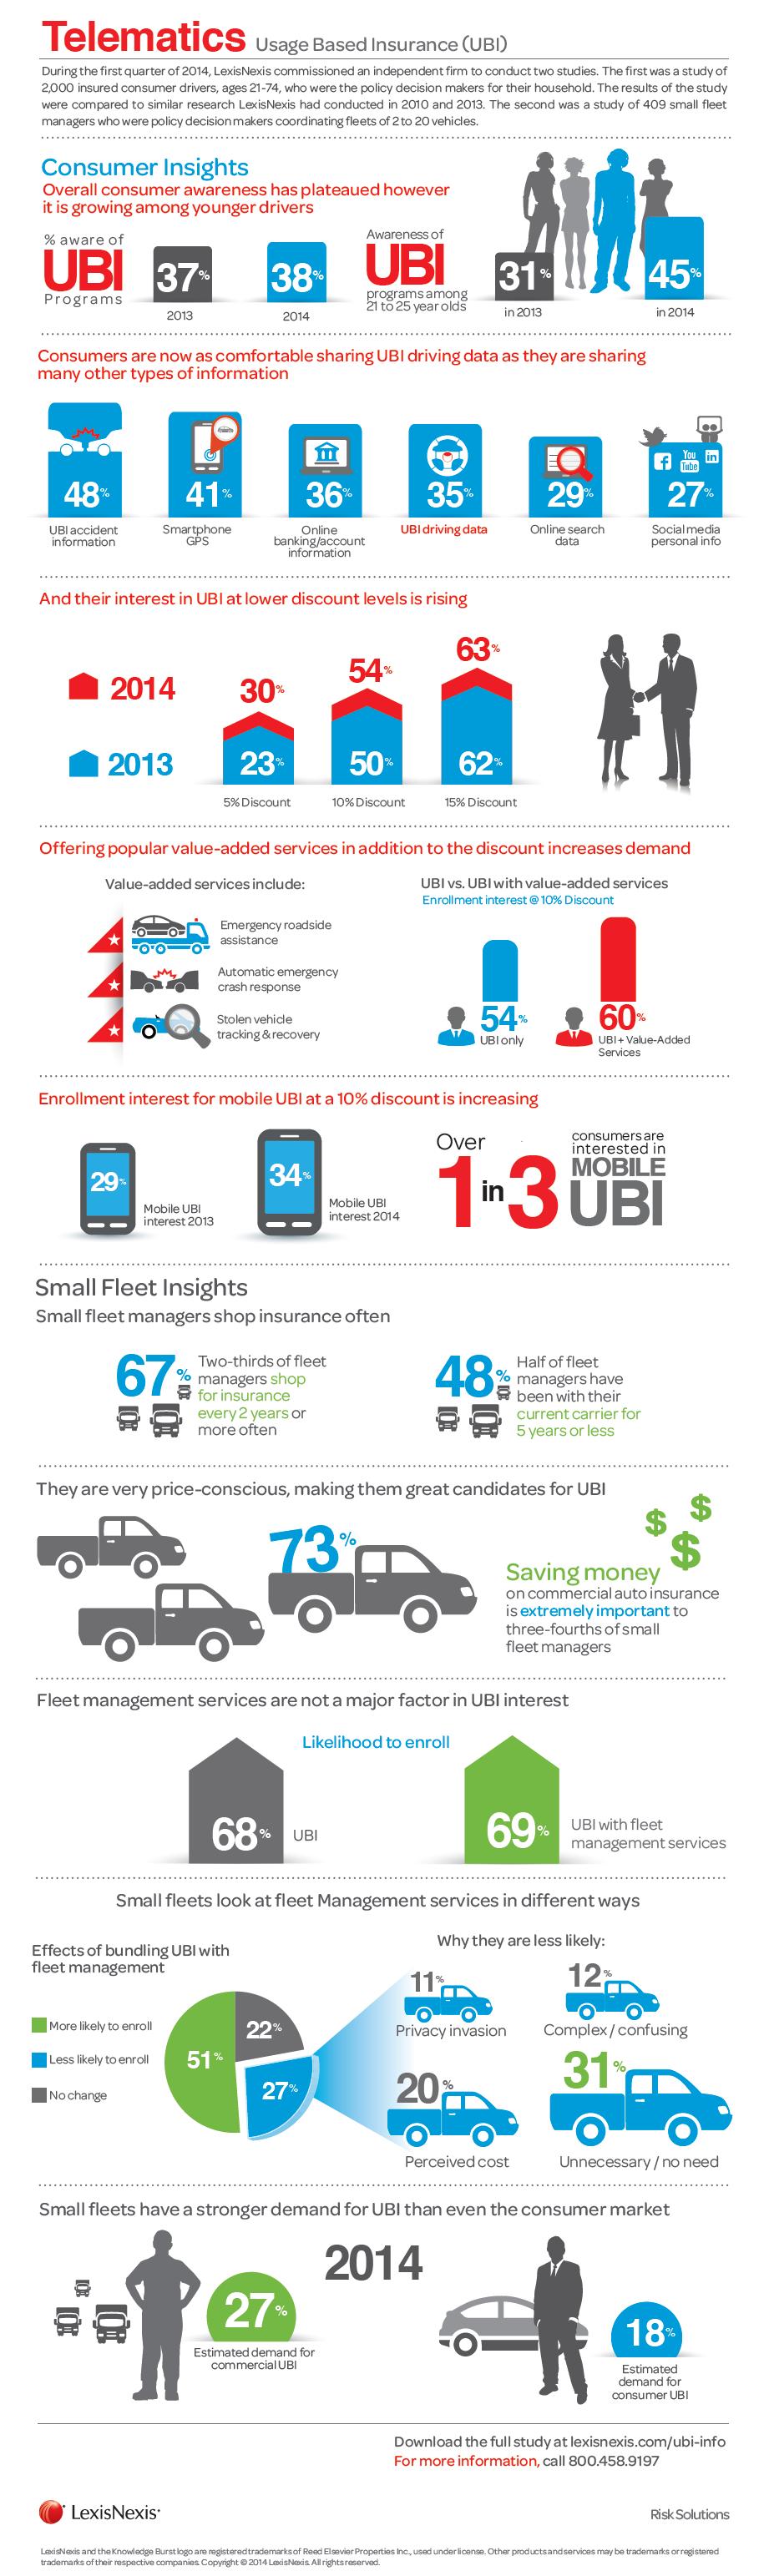 Infographic Usage Based Insurance Ubi Becoming More Popular